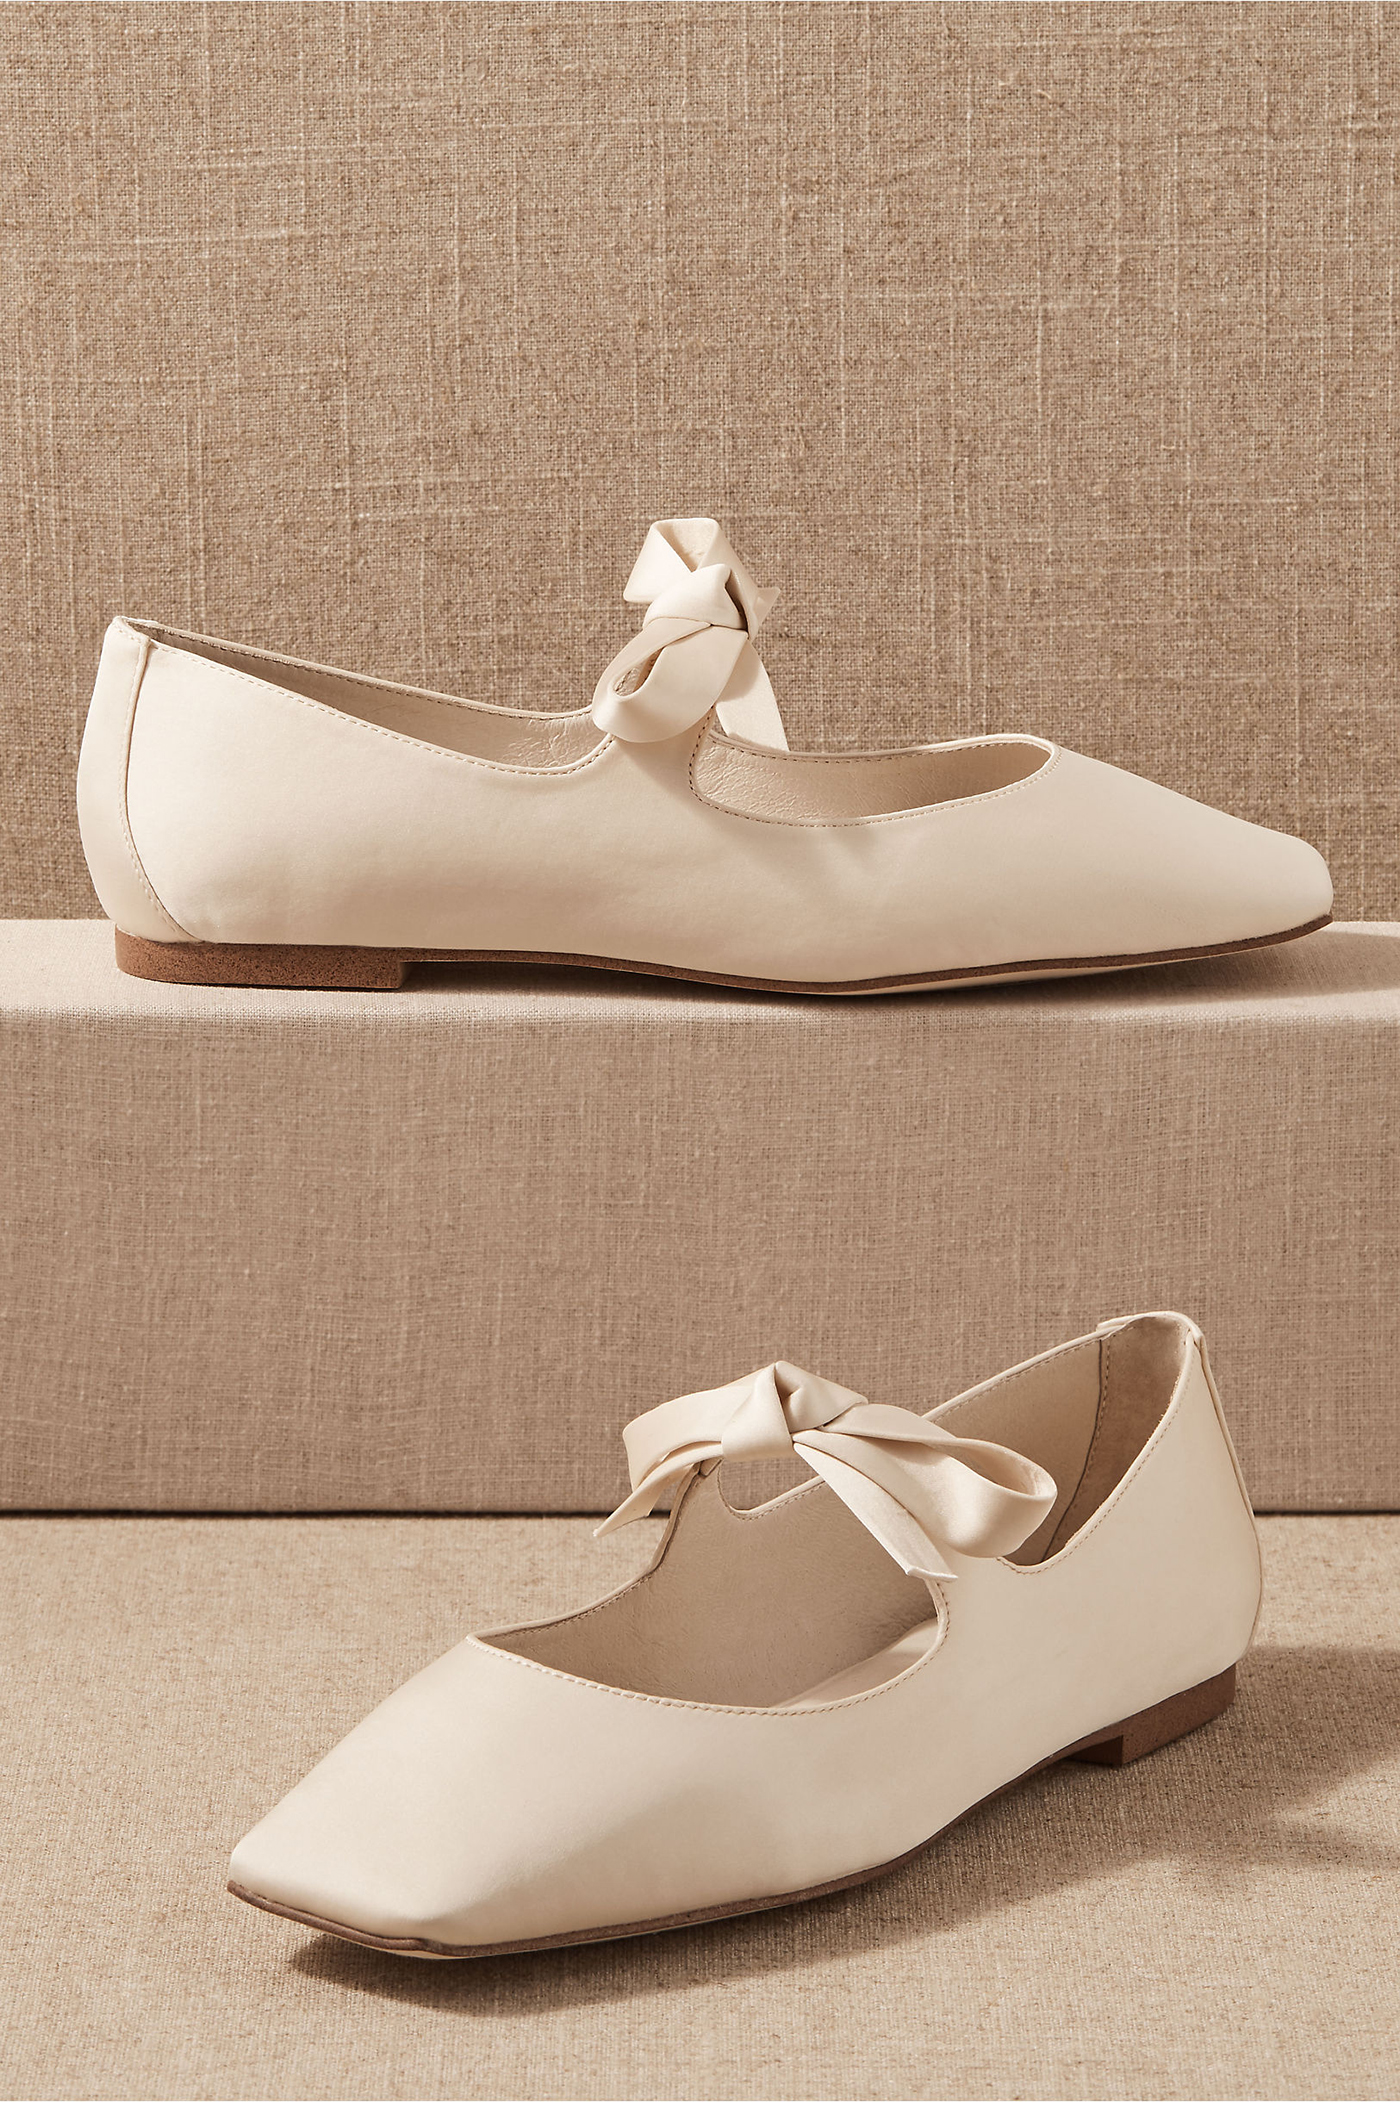 Ballet Flats Inspired by Bridgerton